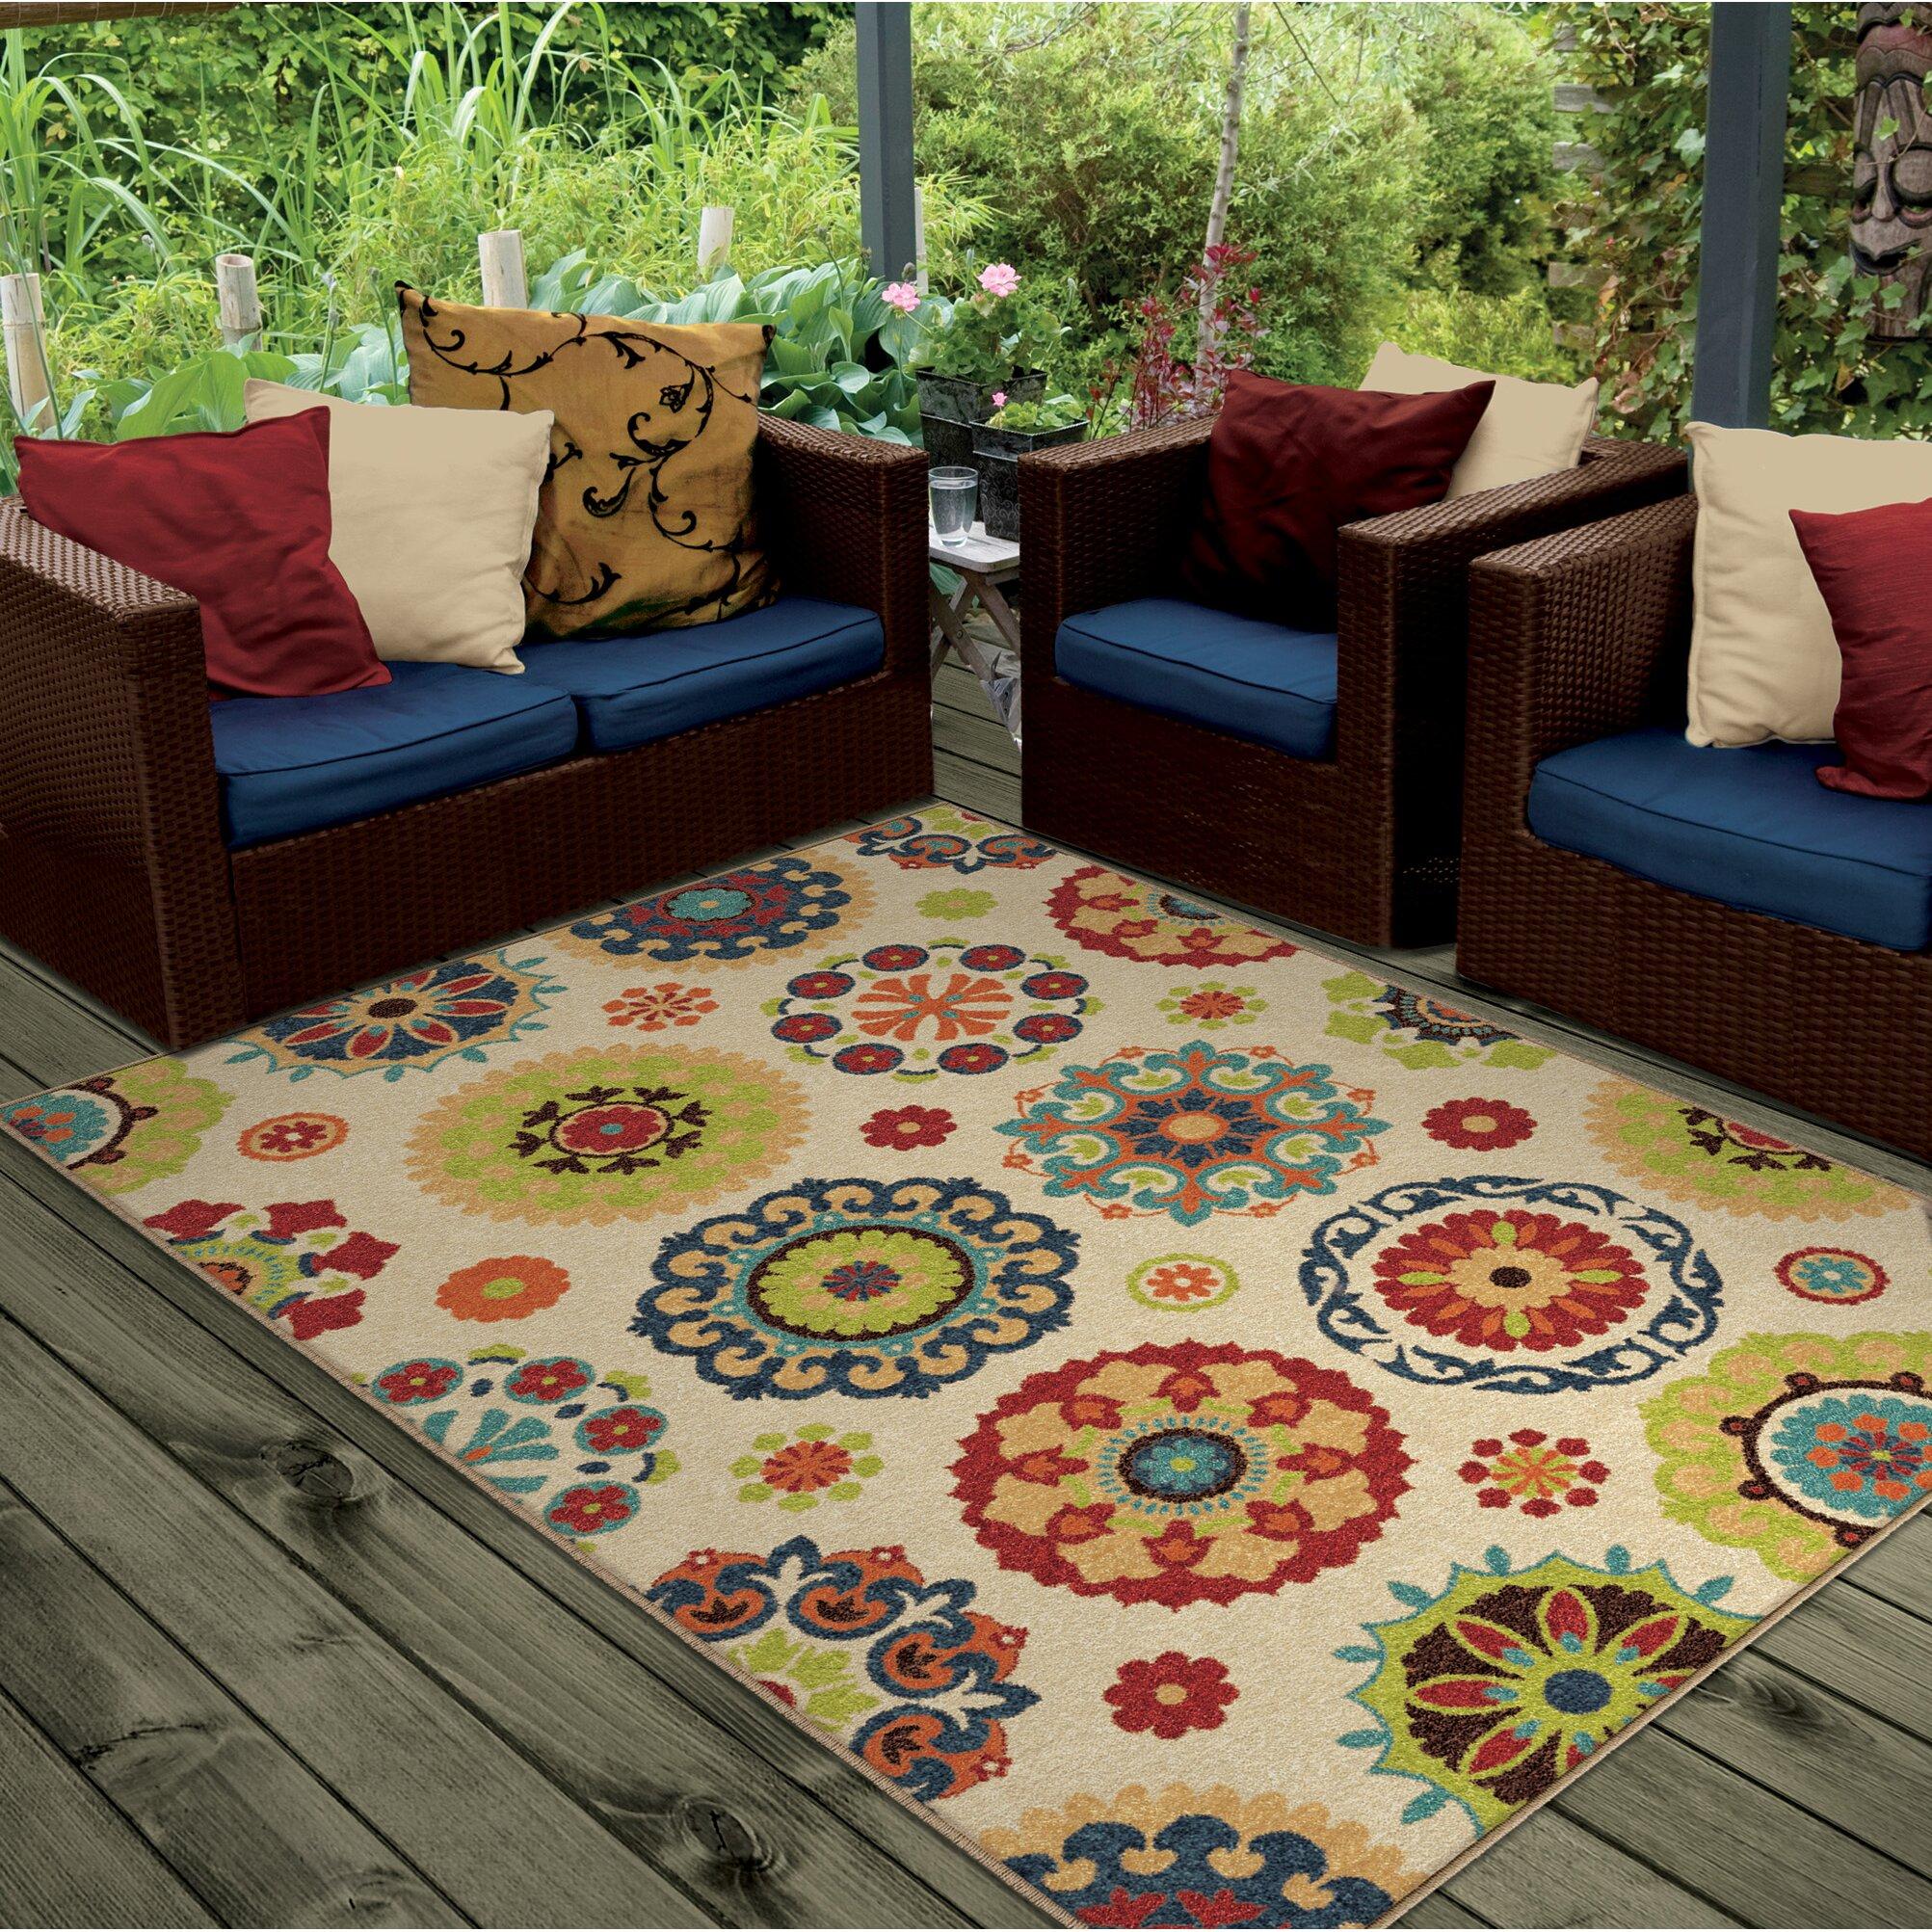 Threadbind dickinson hubbard cream indoor outdoor area rug for Landscape indoor area rug